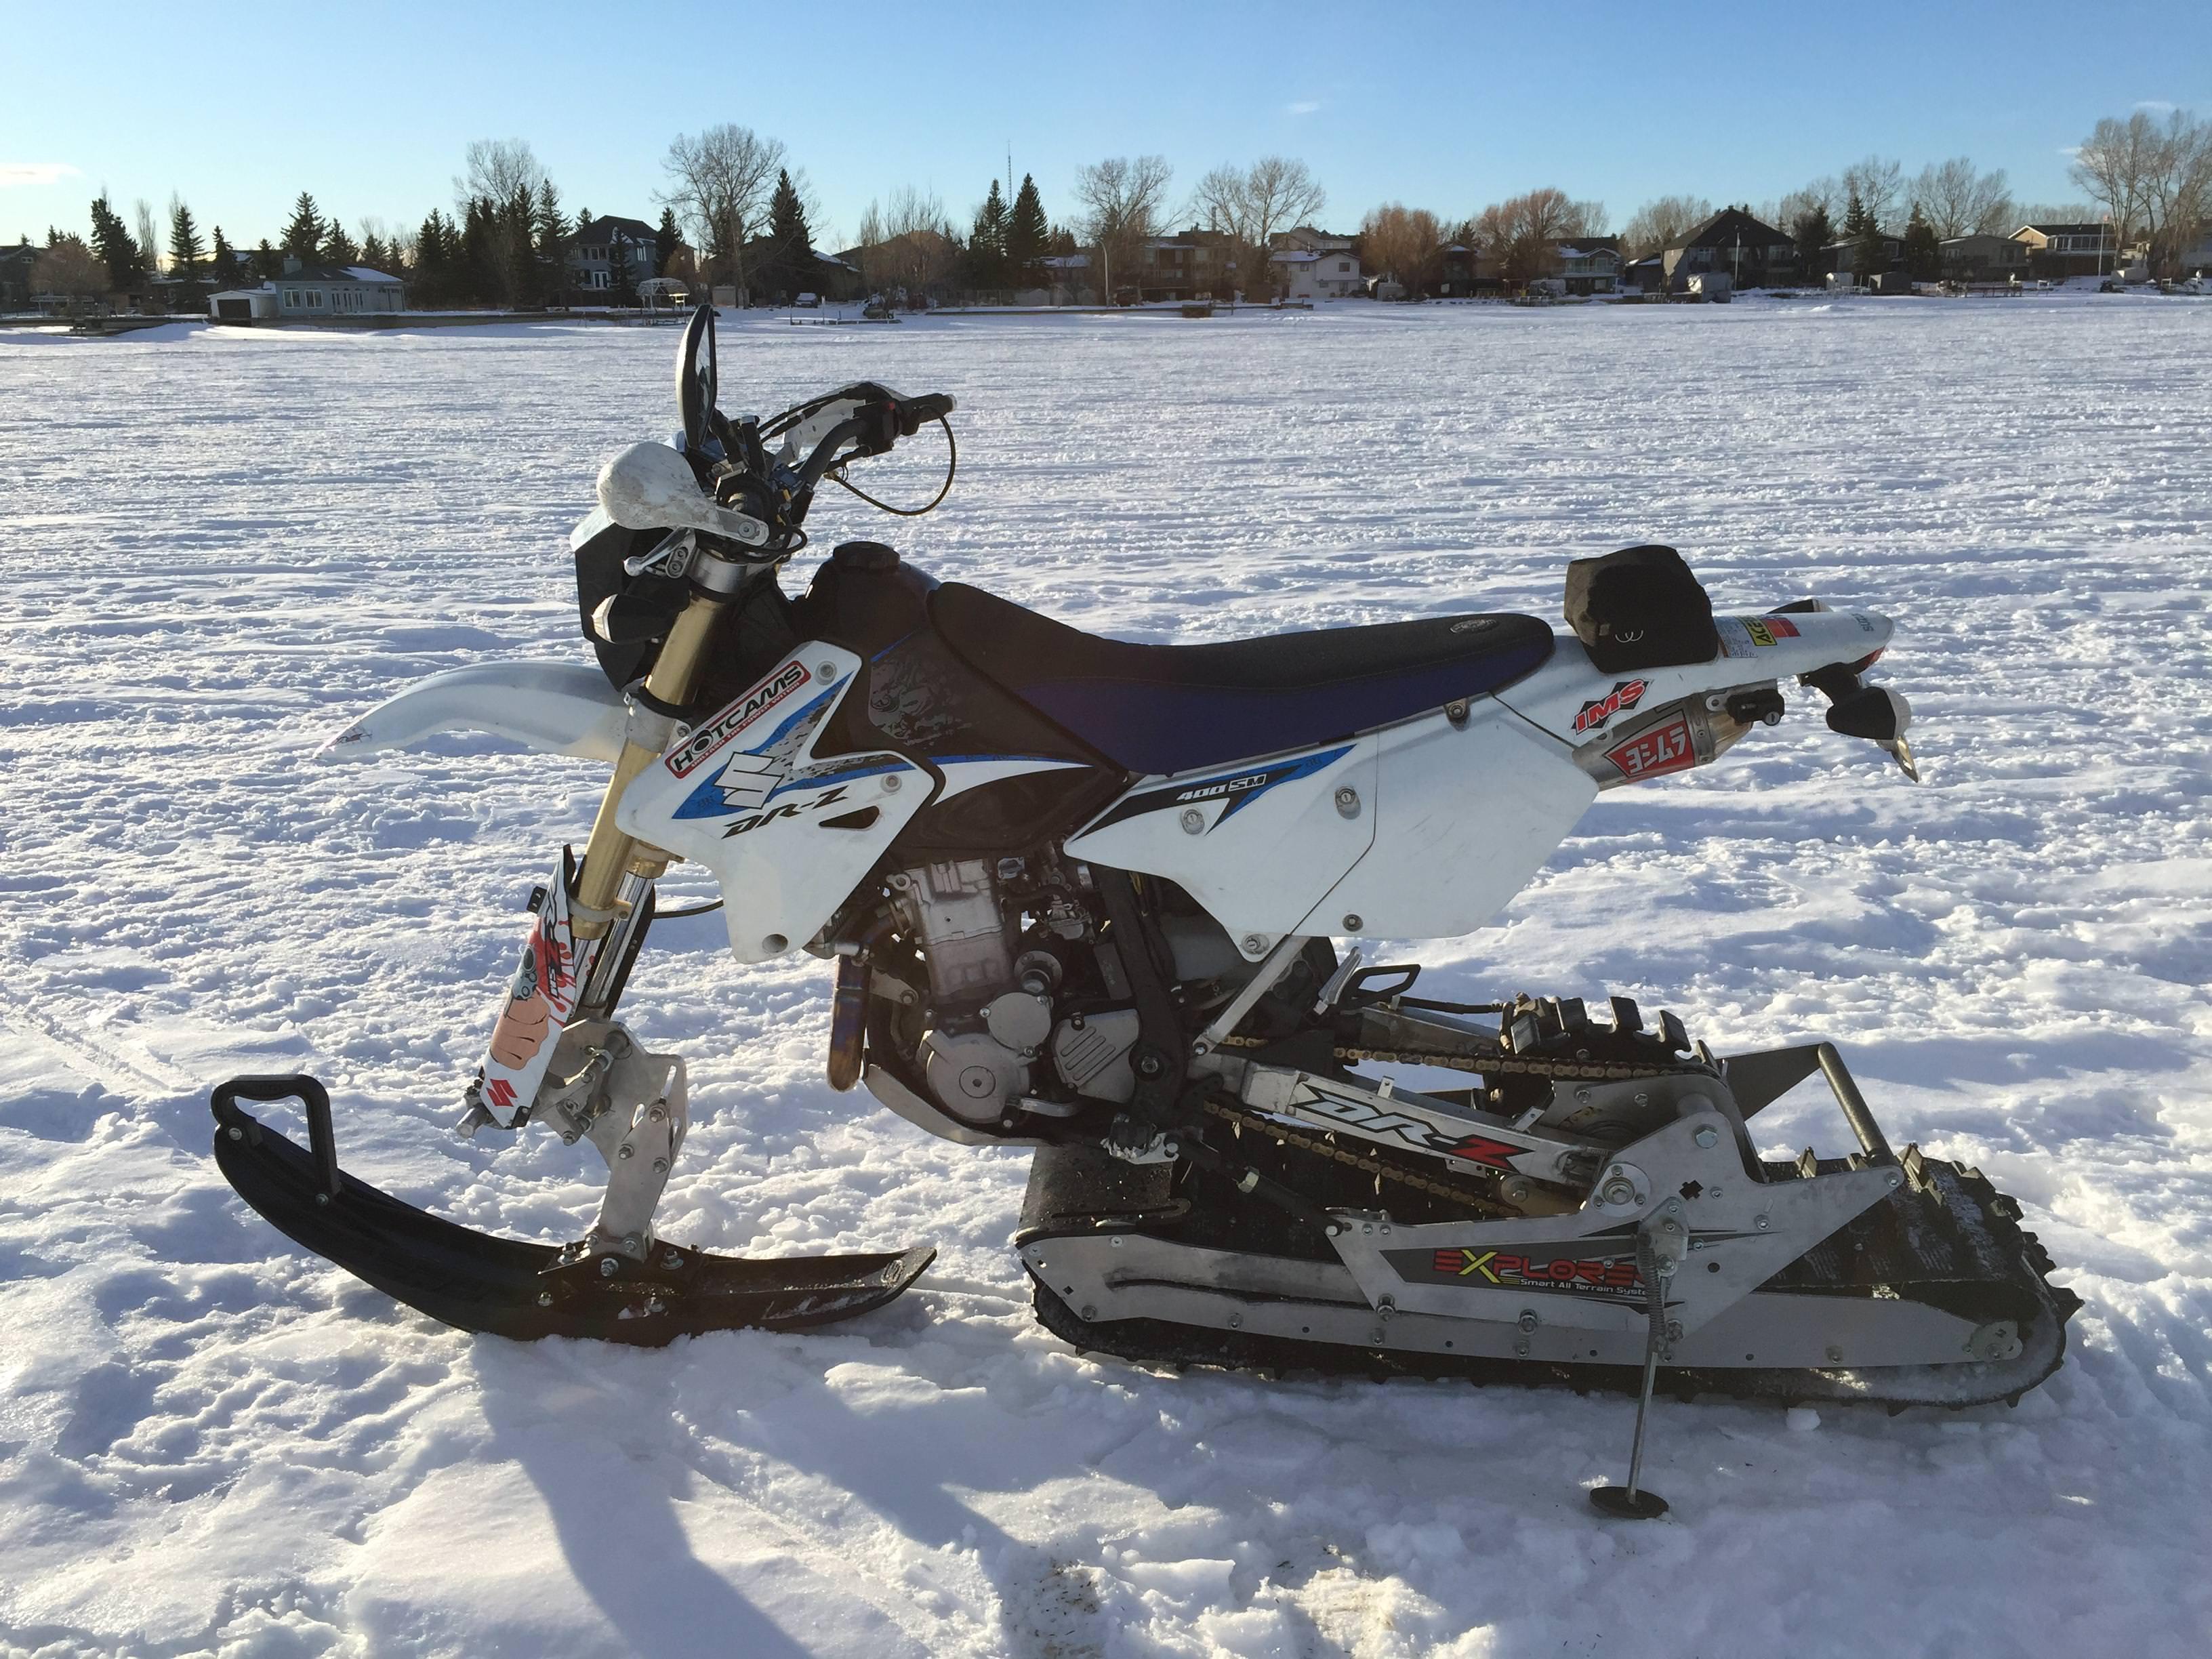 Snow bike AD Boivin Explorer kit on 13 Suzuki DRZ400 SM   Album 3264x2448